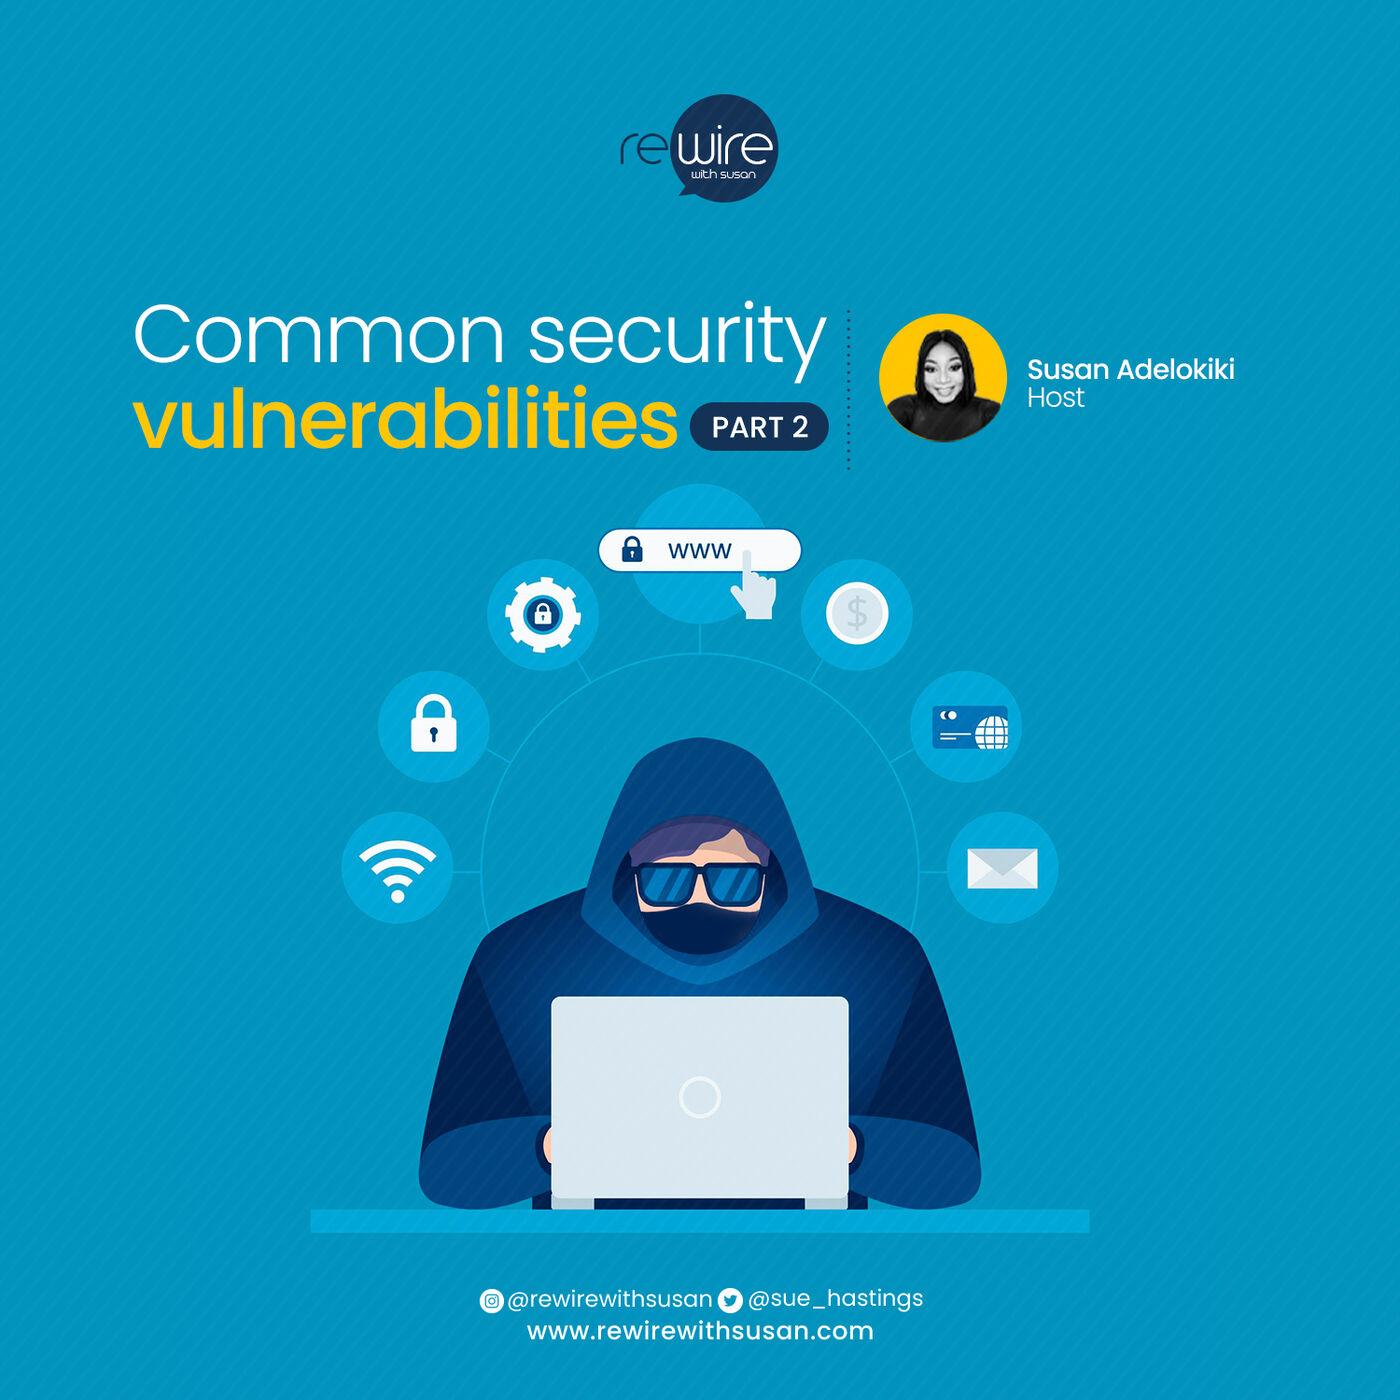 Common security vulnerabilities(Part 2)